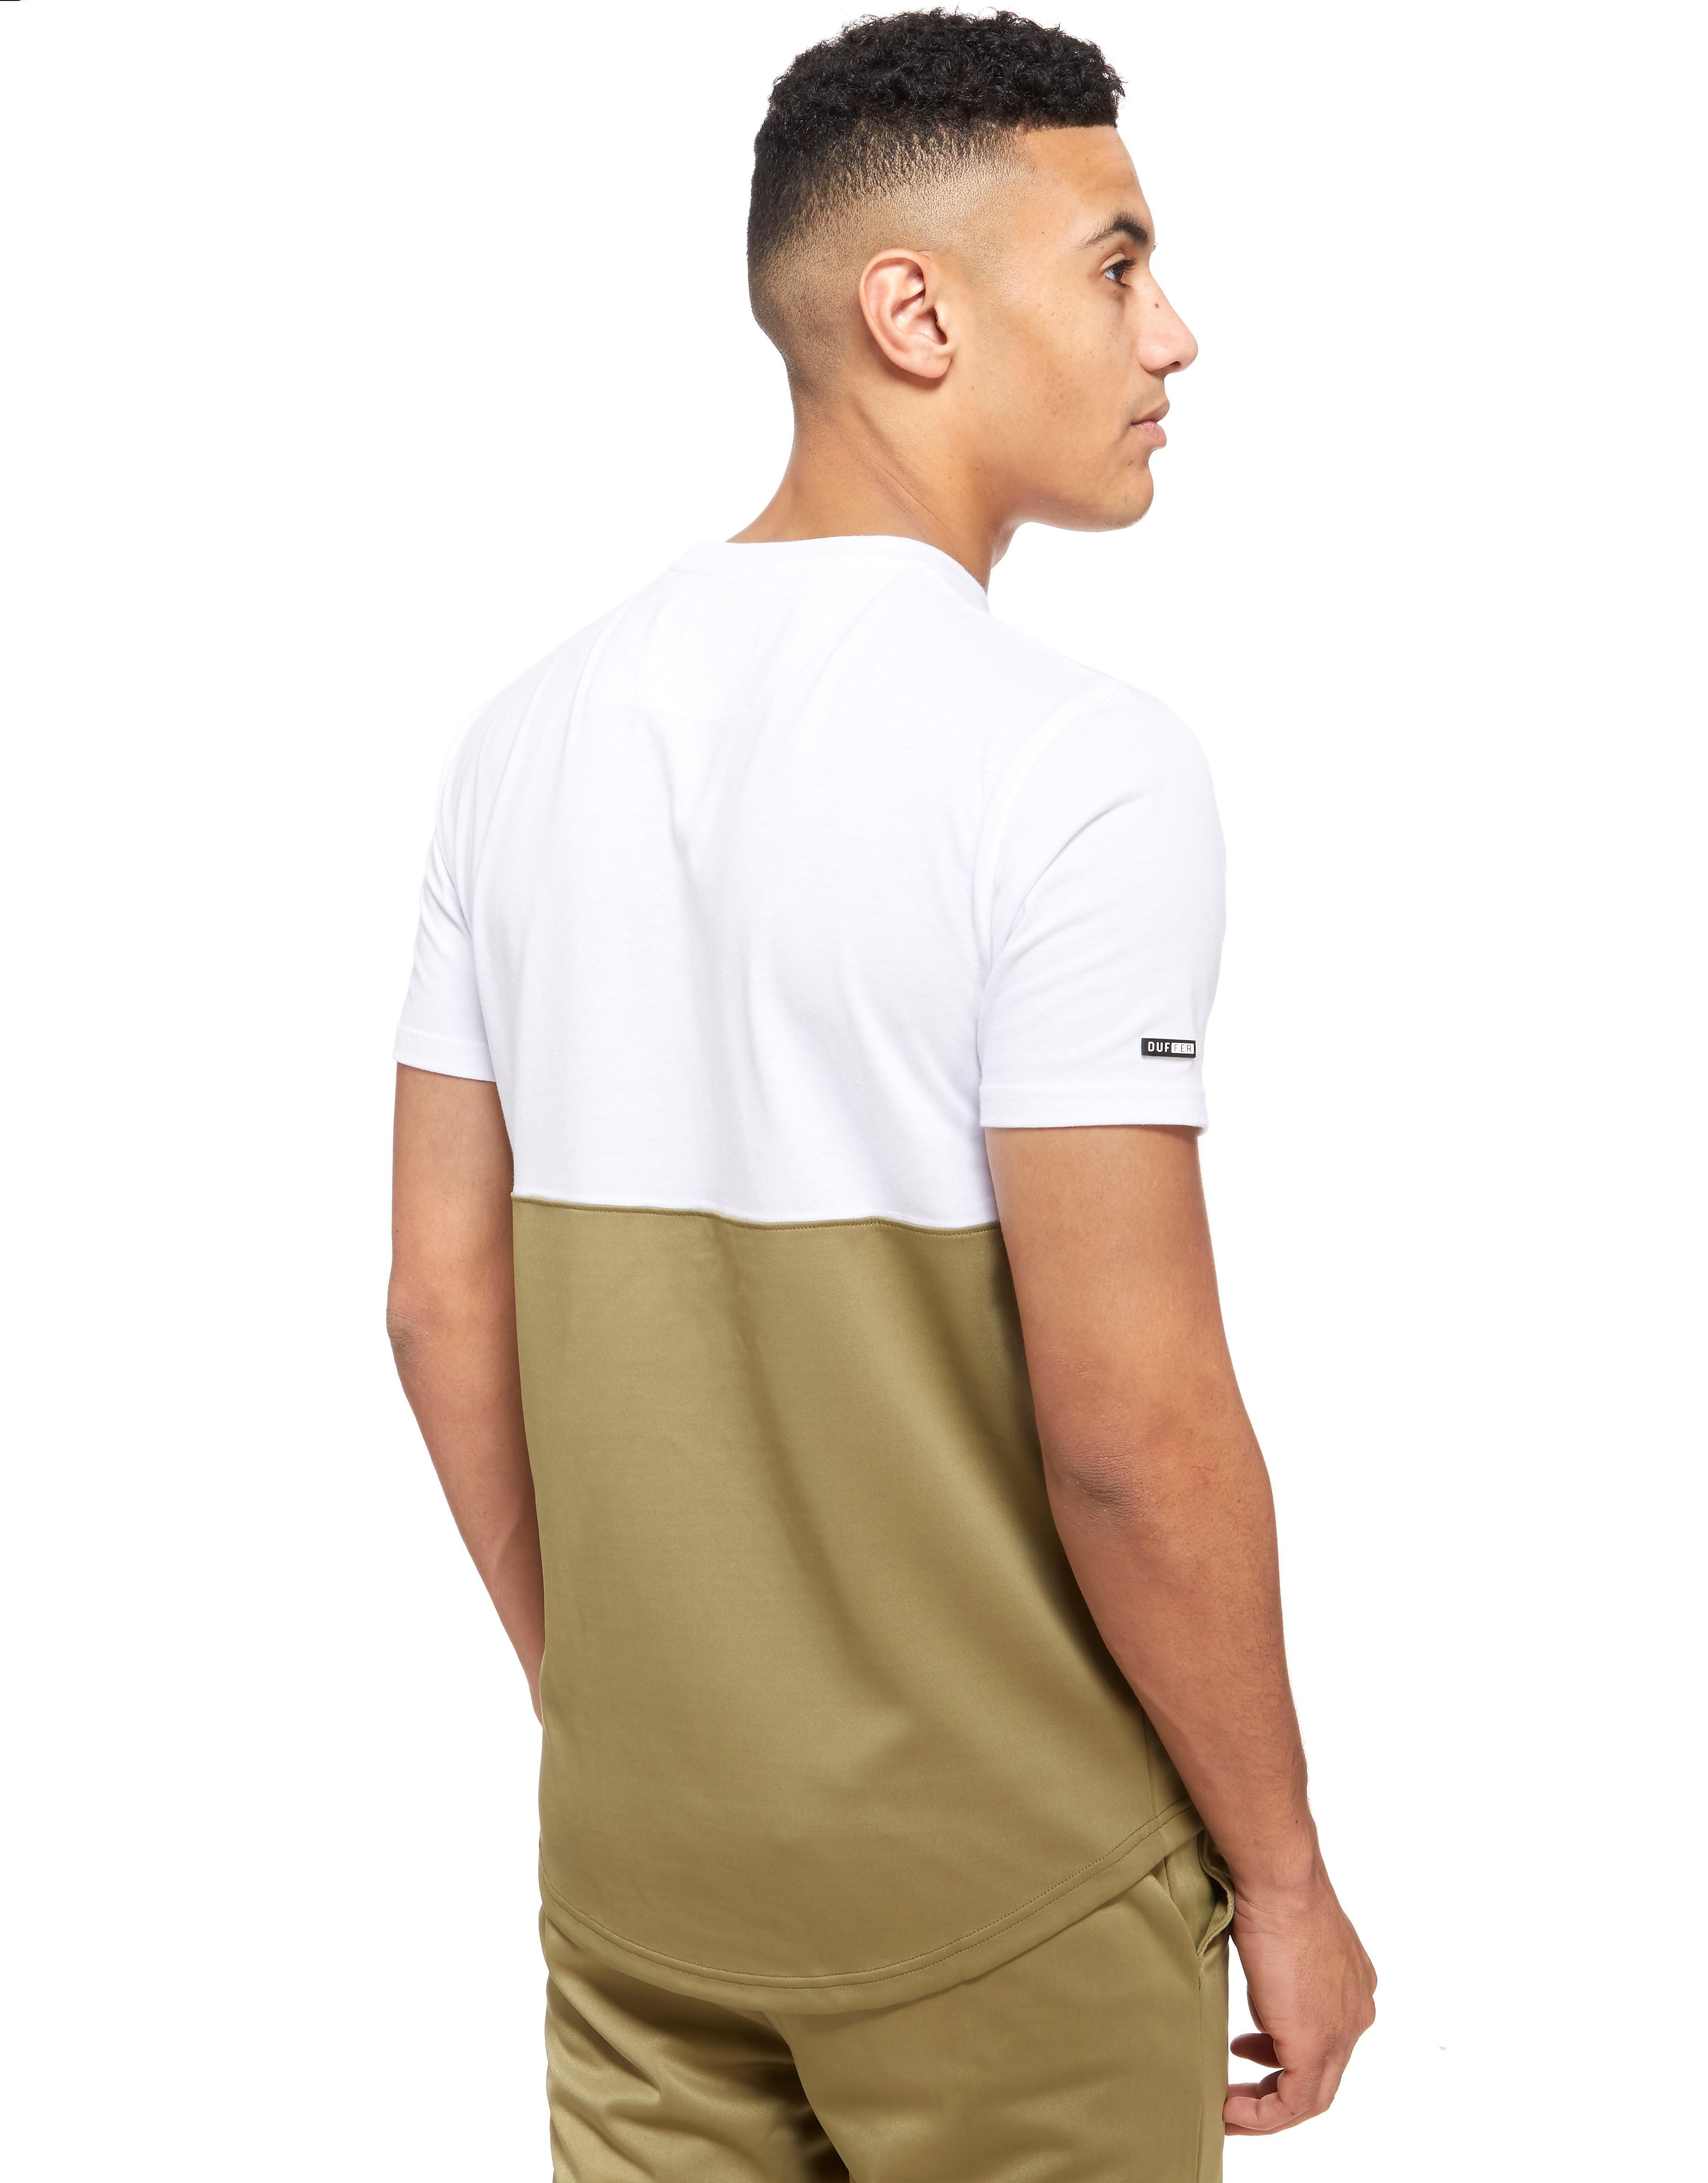 Duffer of St George Form T-Shirt